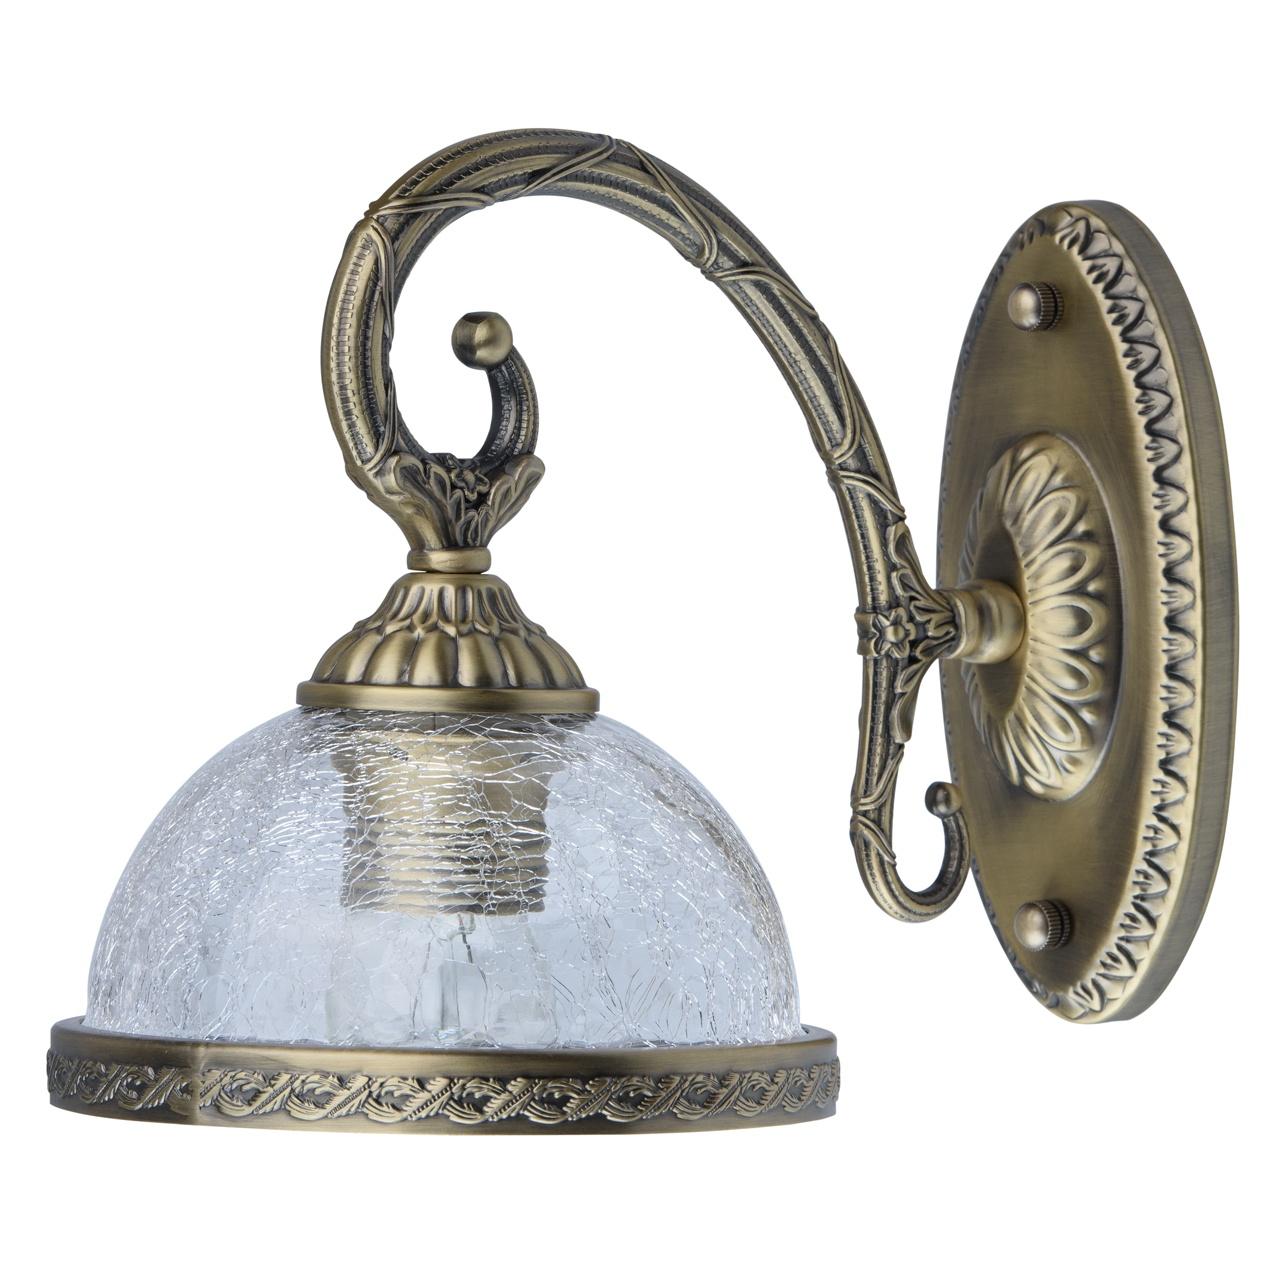 Настенный светильник MW Аманда, 481021901, бронза бра аманда 5 481021401 mw light 1113614 page 4